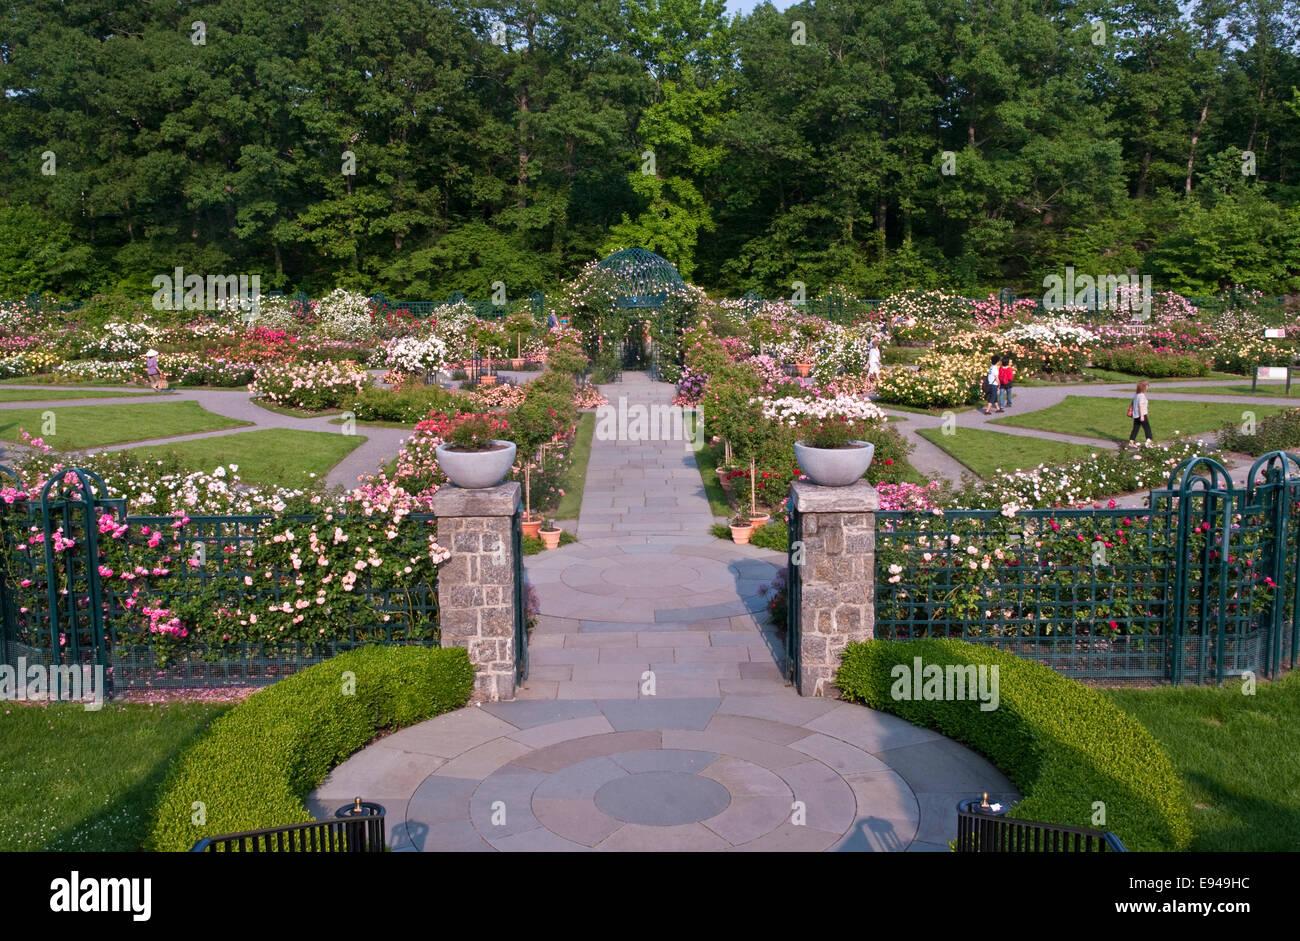 Peggy Rockefeller Rose Garden At The New York Botanical Garden Stock Photo Royalty Free Image